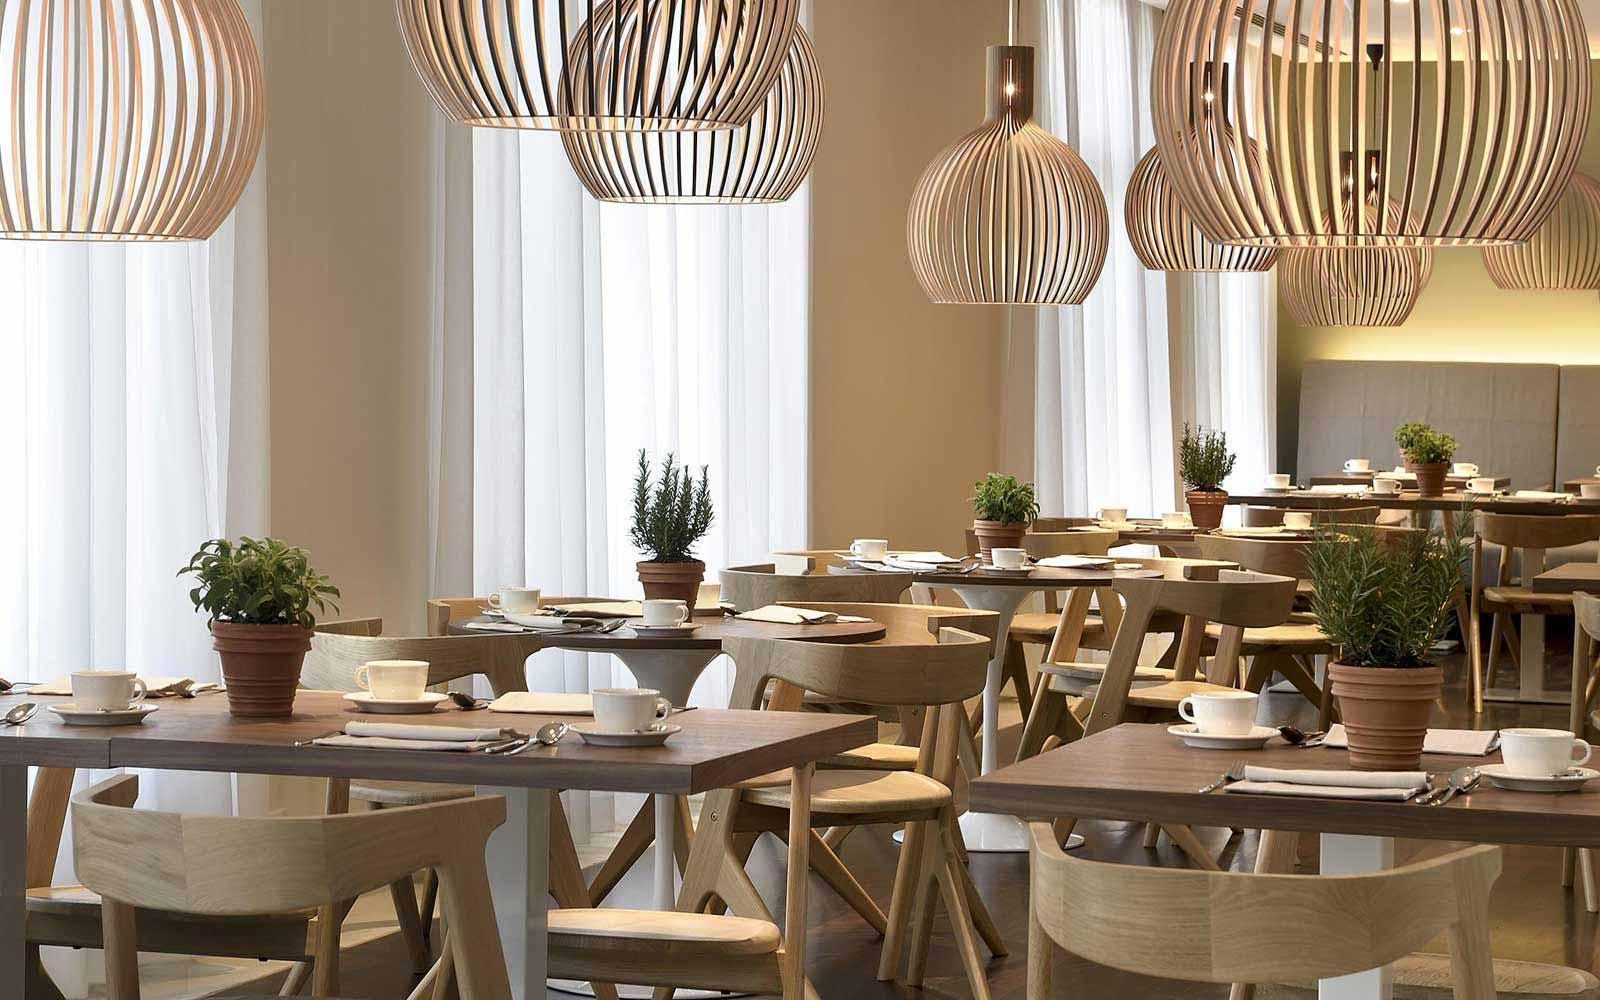 Cucina Restaurant  at the JW Marriott Venice Resort & Spa